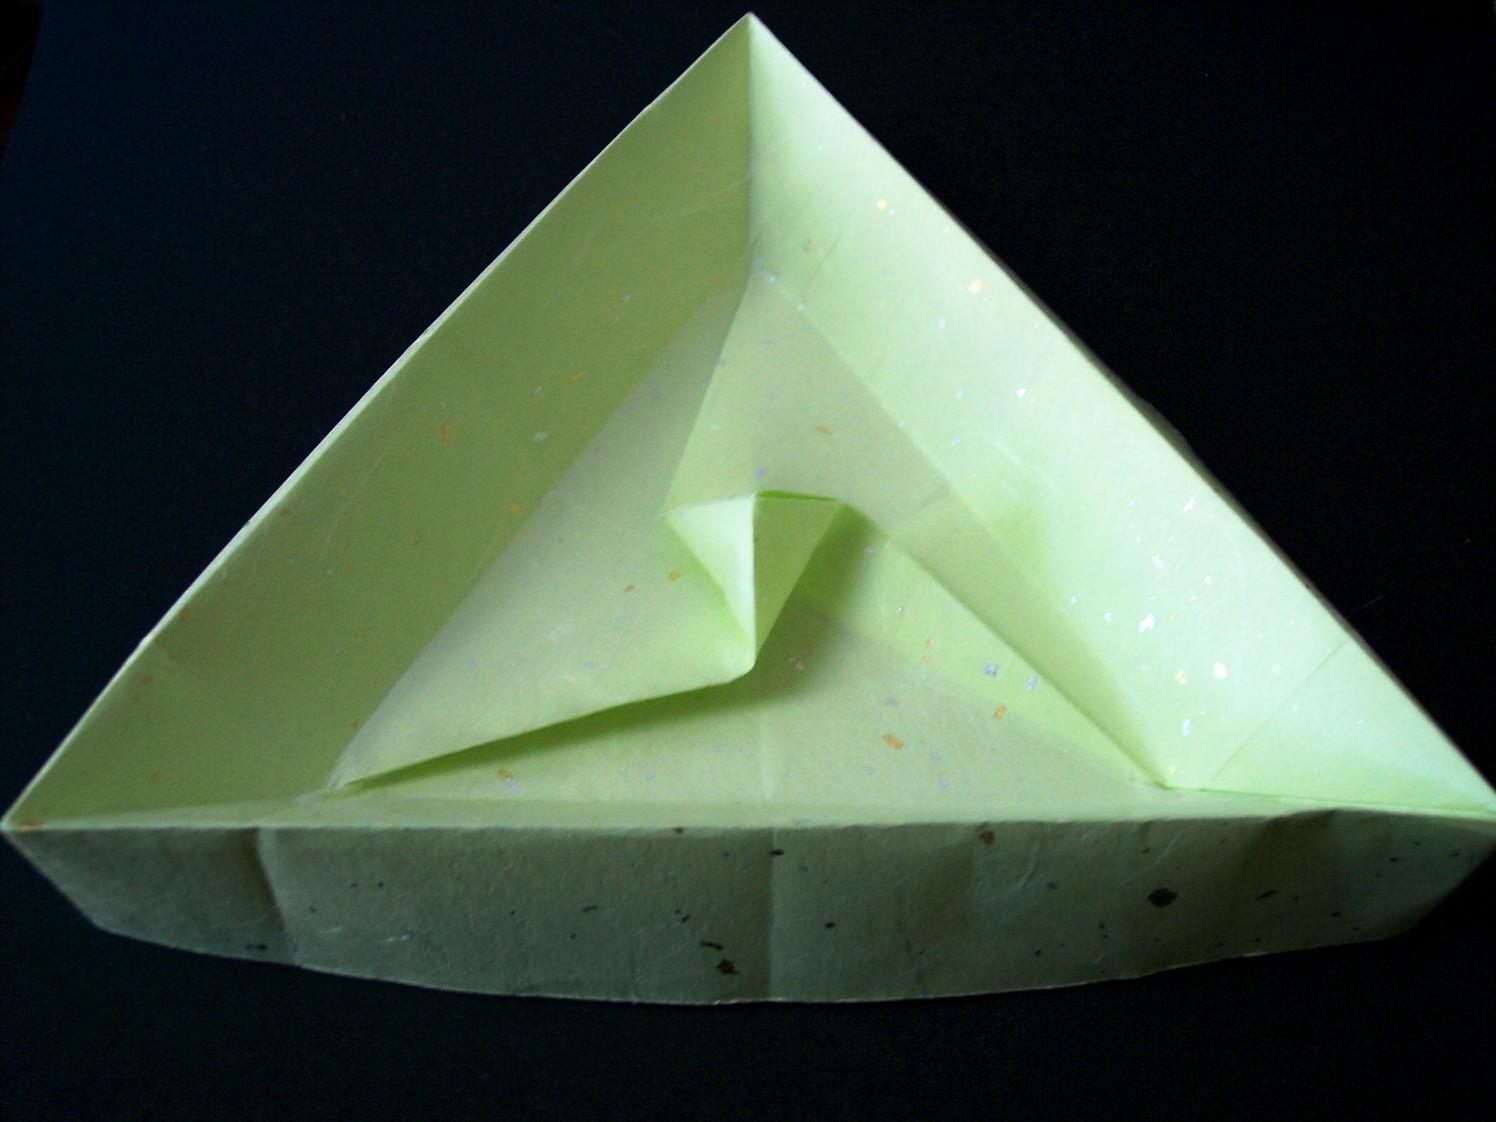 printable pyramid diagram ezgo marathon gas golf cart wiring origami containers « embroidery &